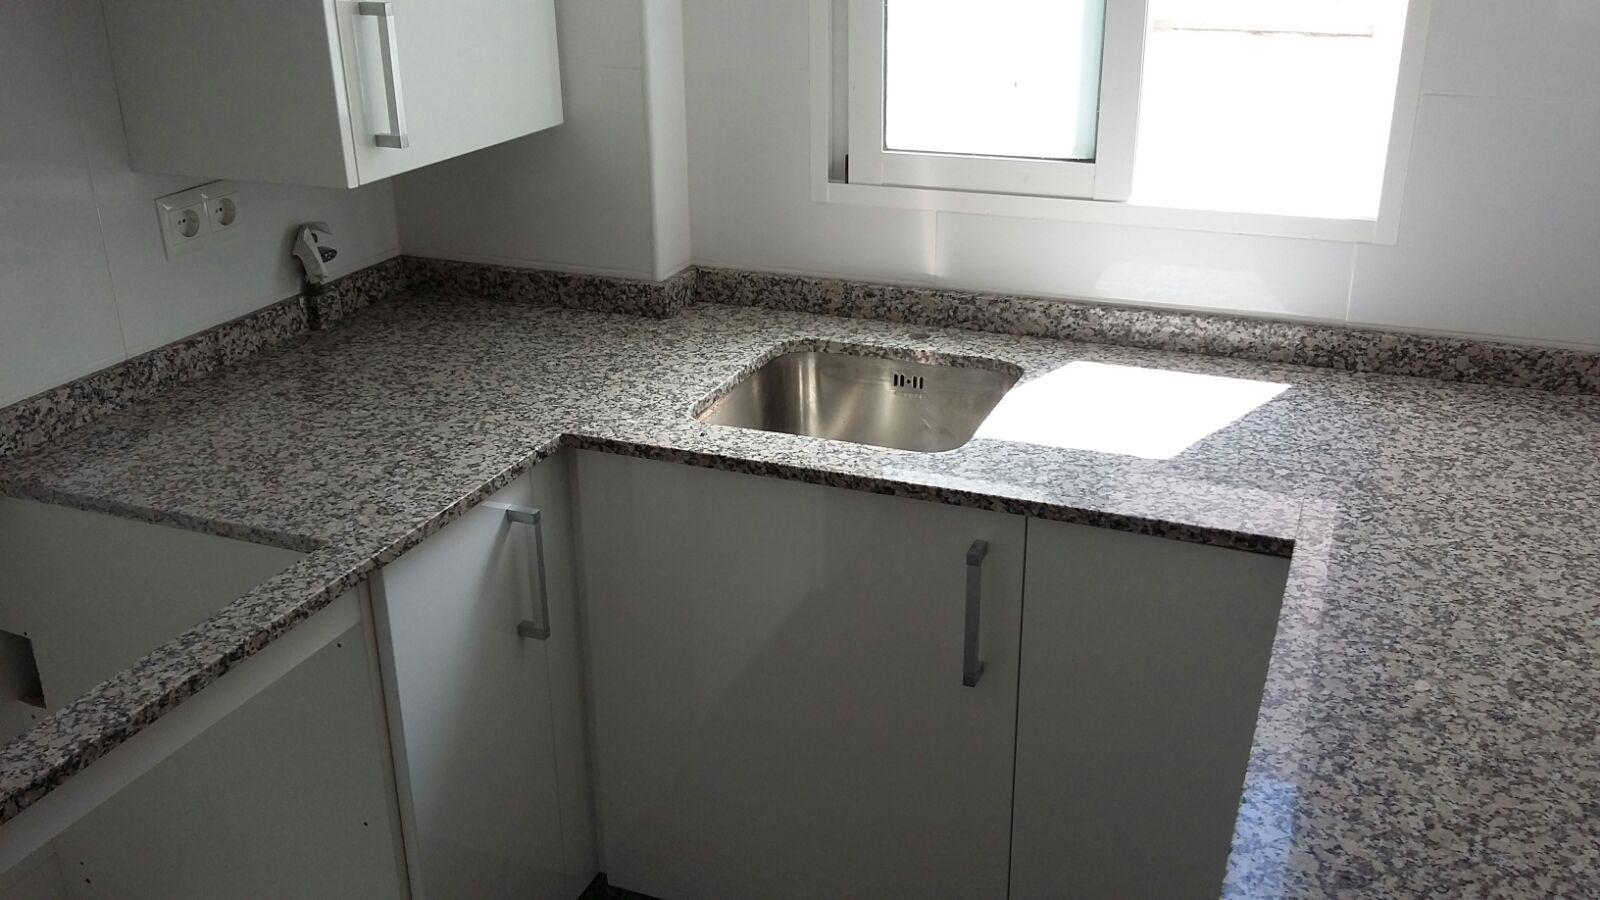 Encimera granito nacional gris mondariz cool encimeras for Encimera de granito gris